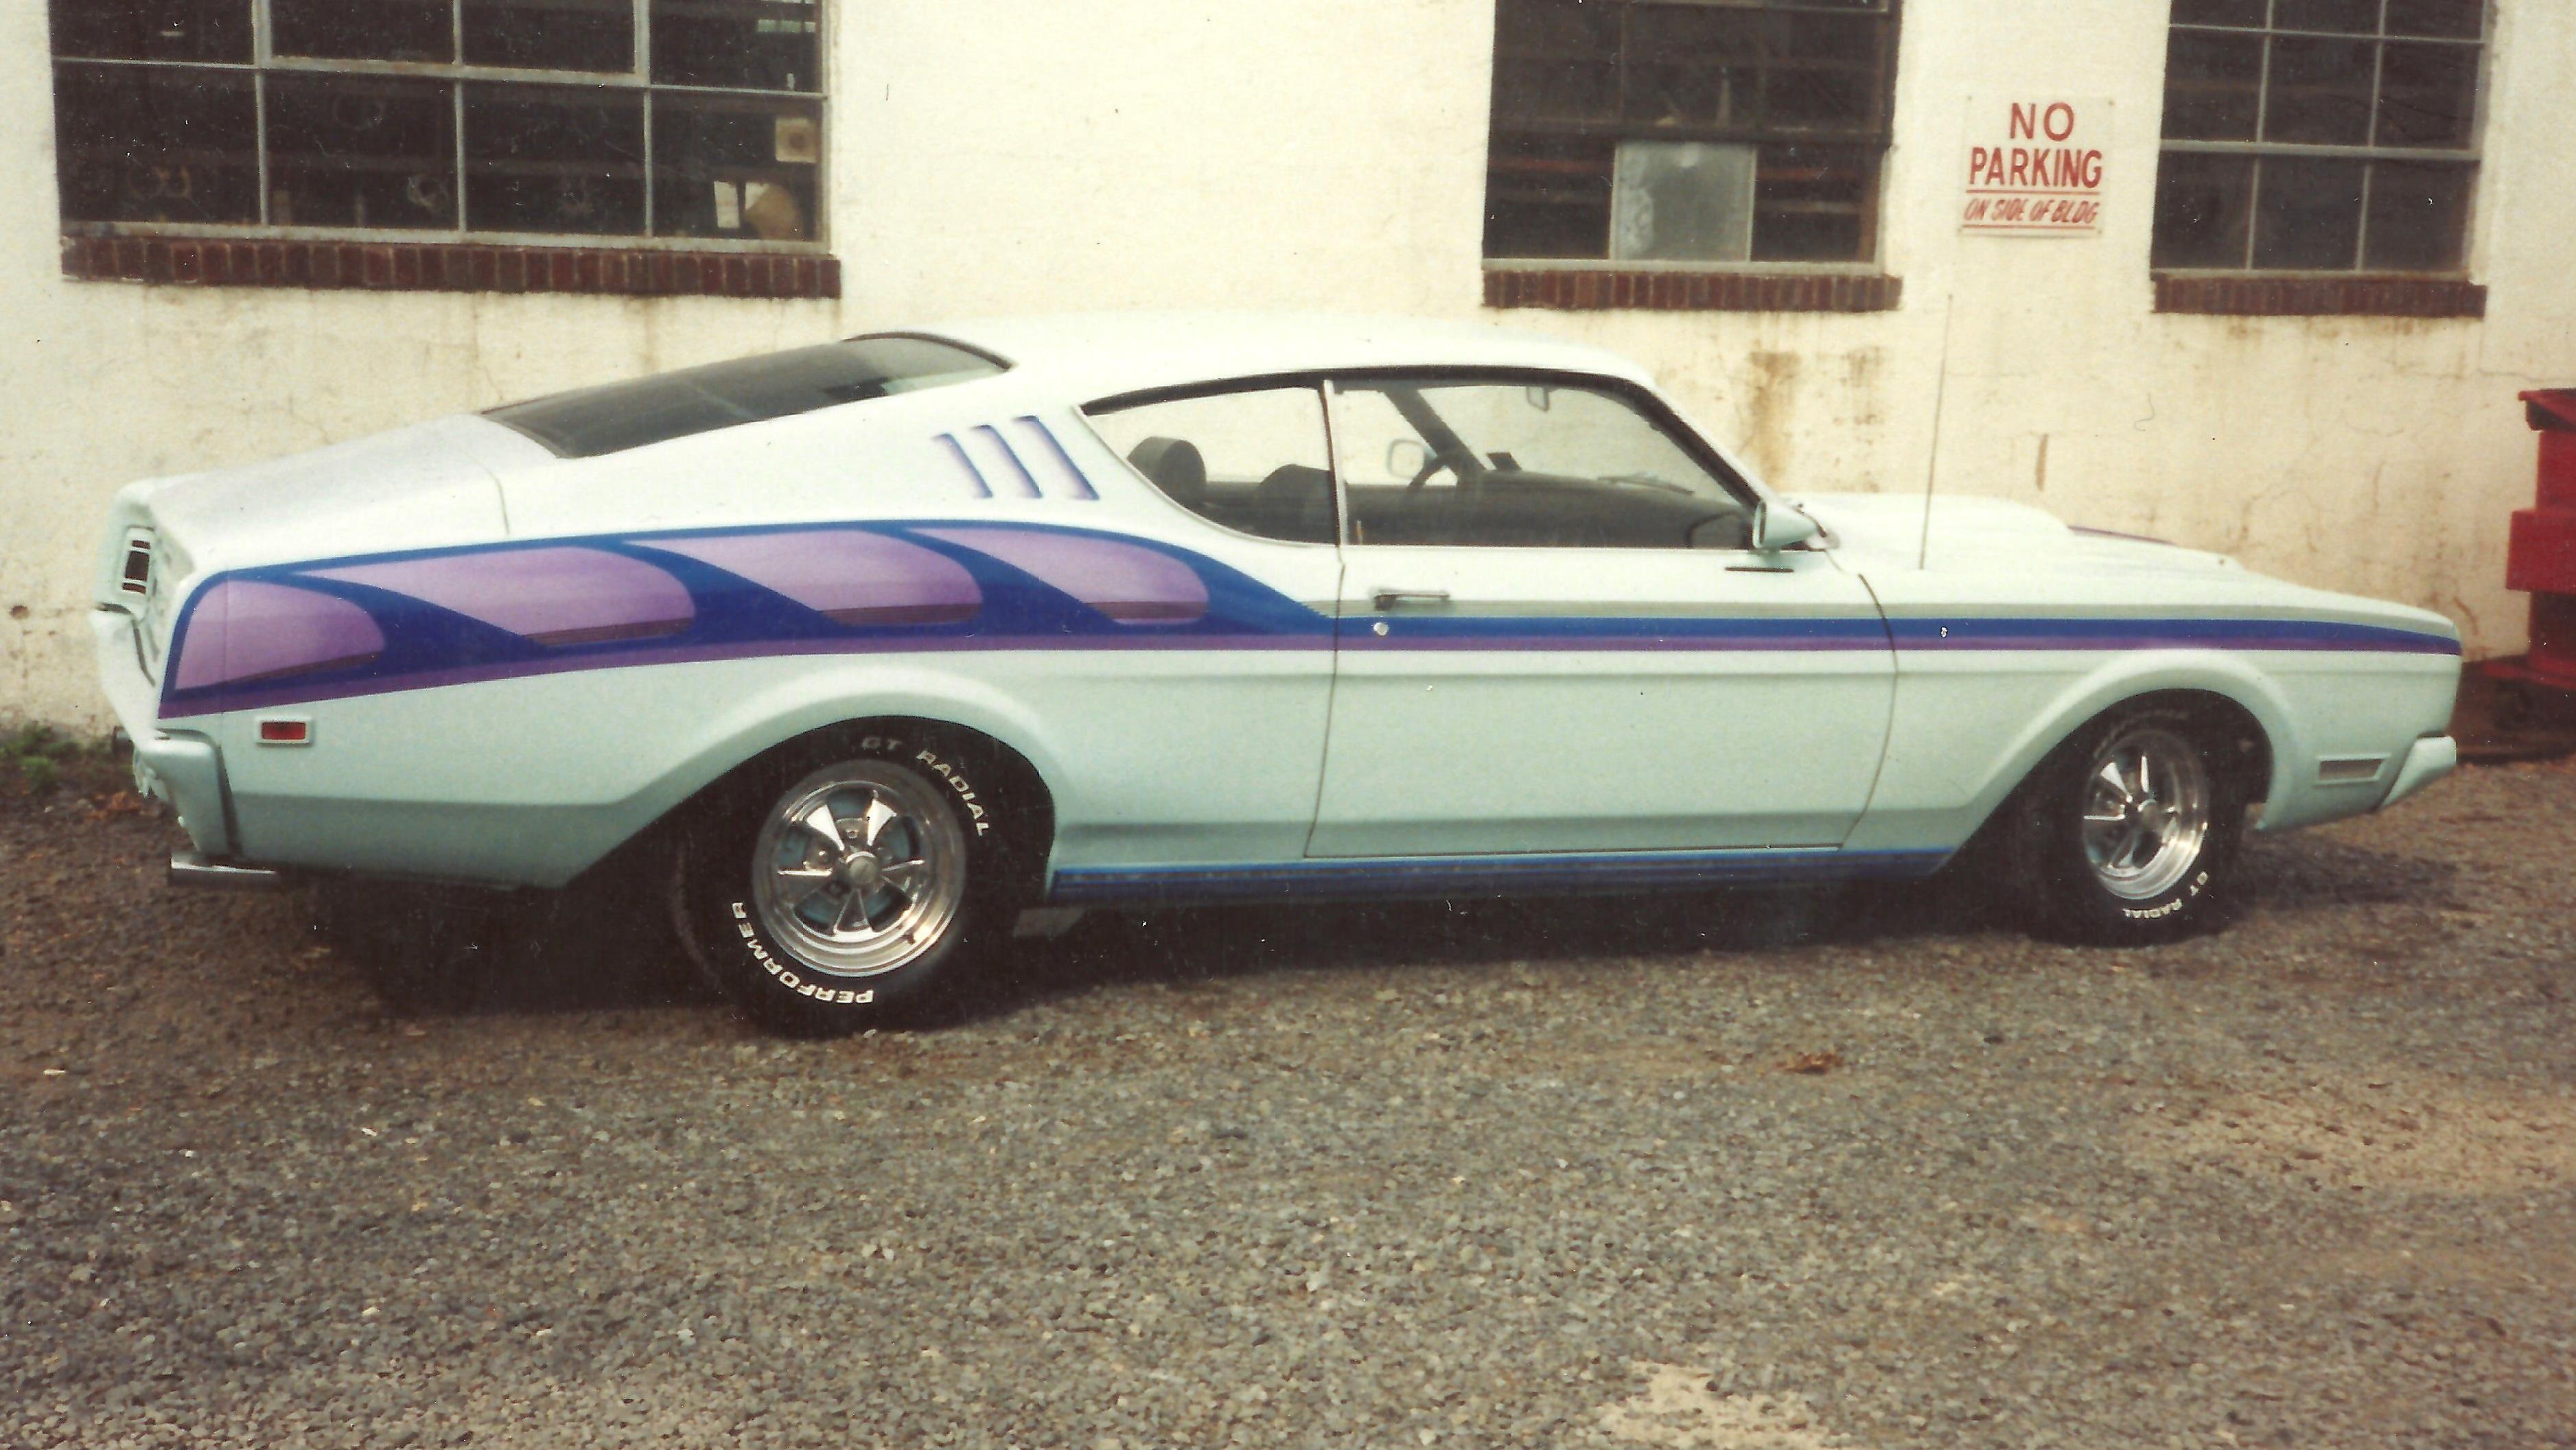 1969 Merc Cyclone